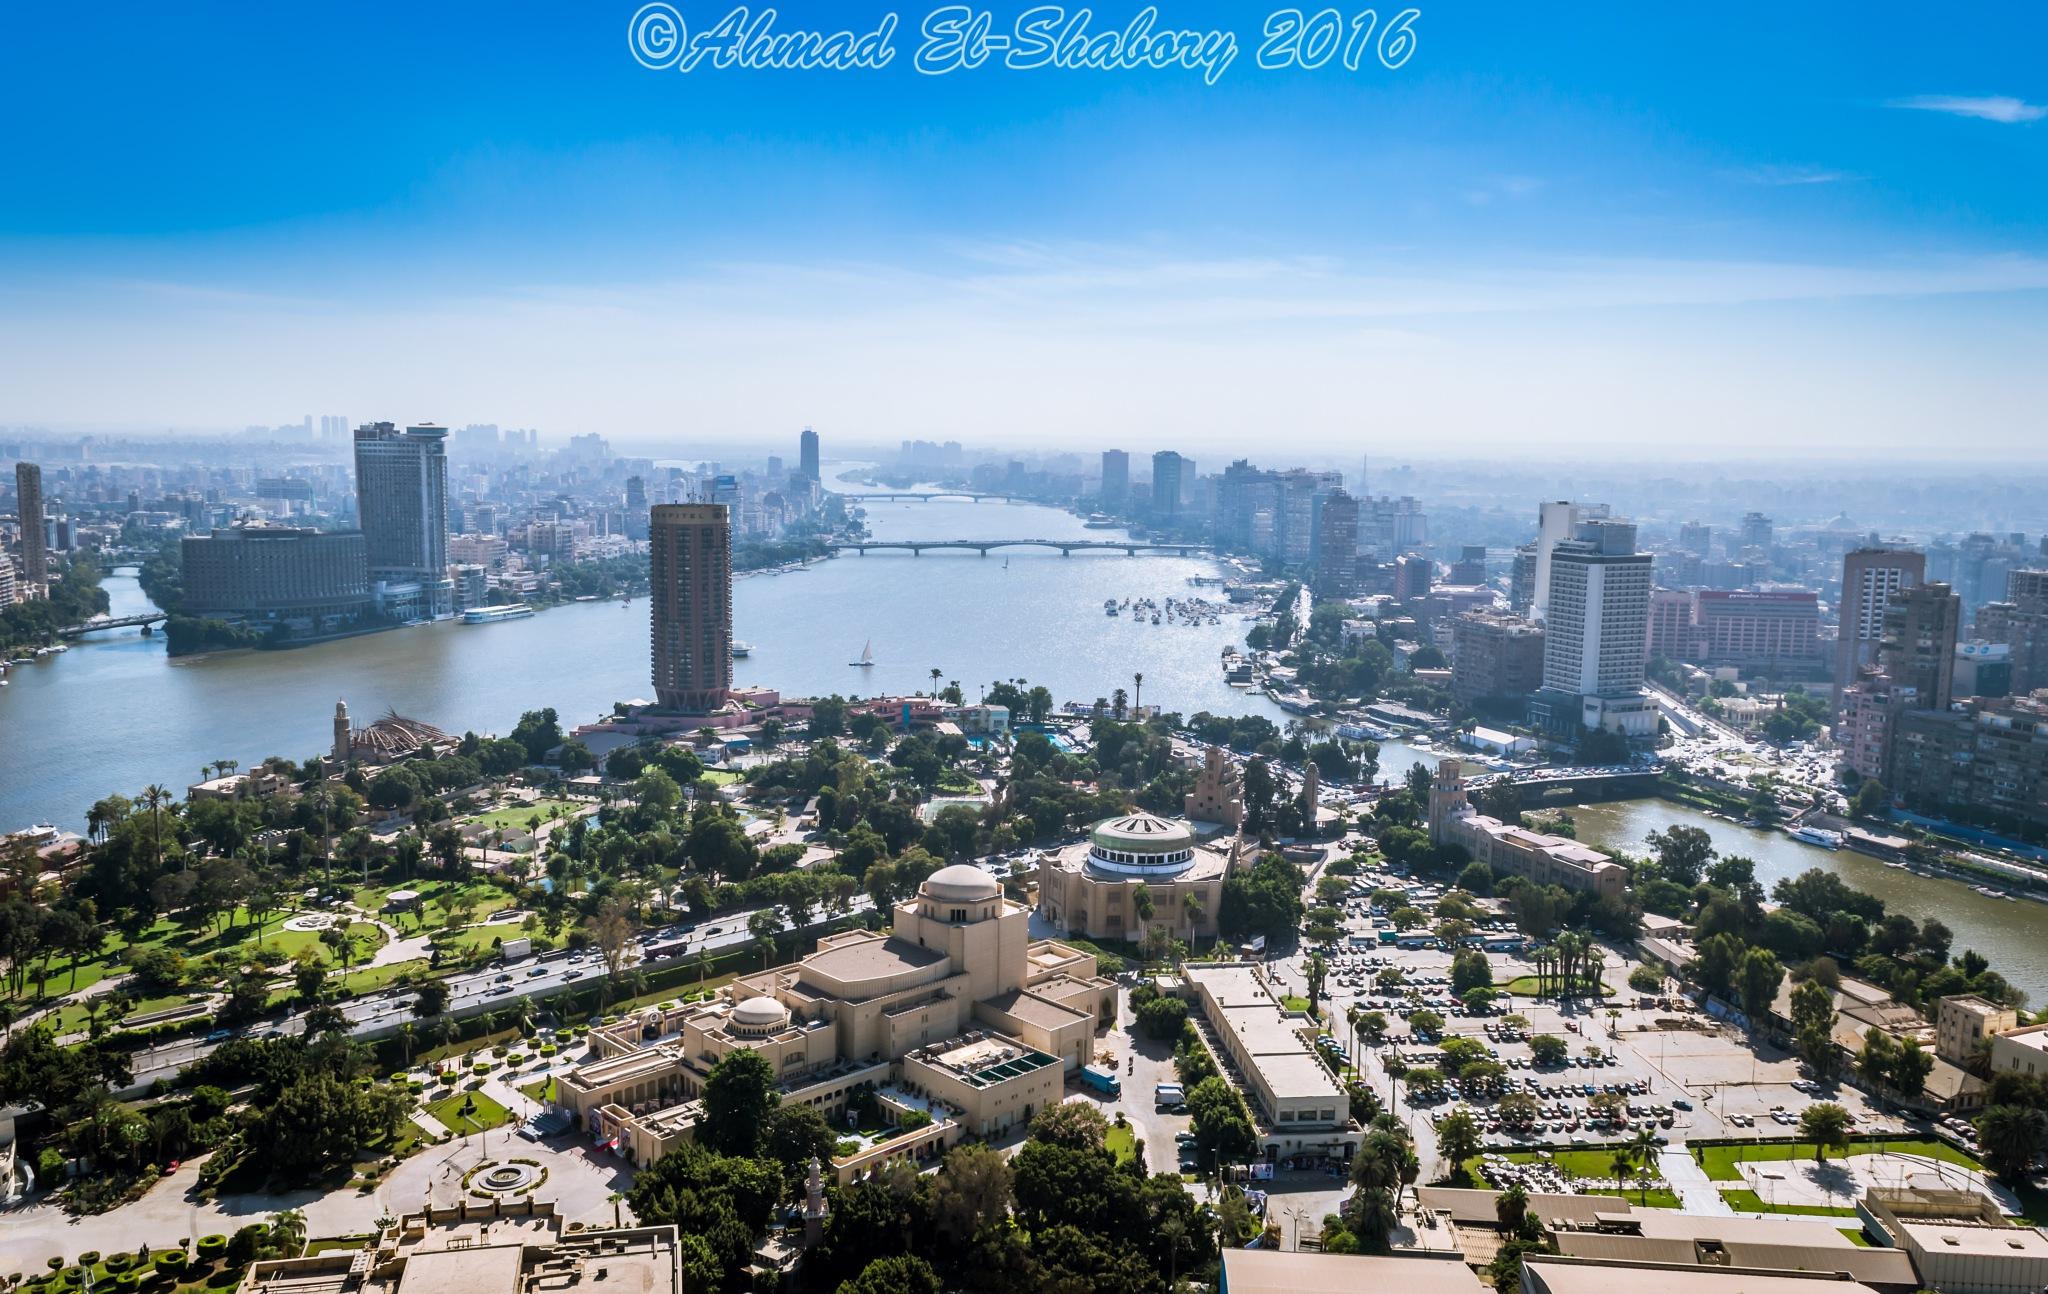 Cairo View by Ahmad Al-Shabory